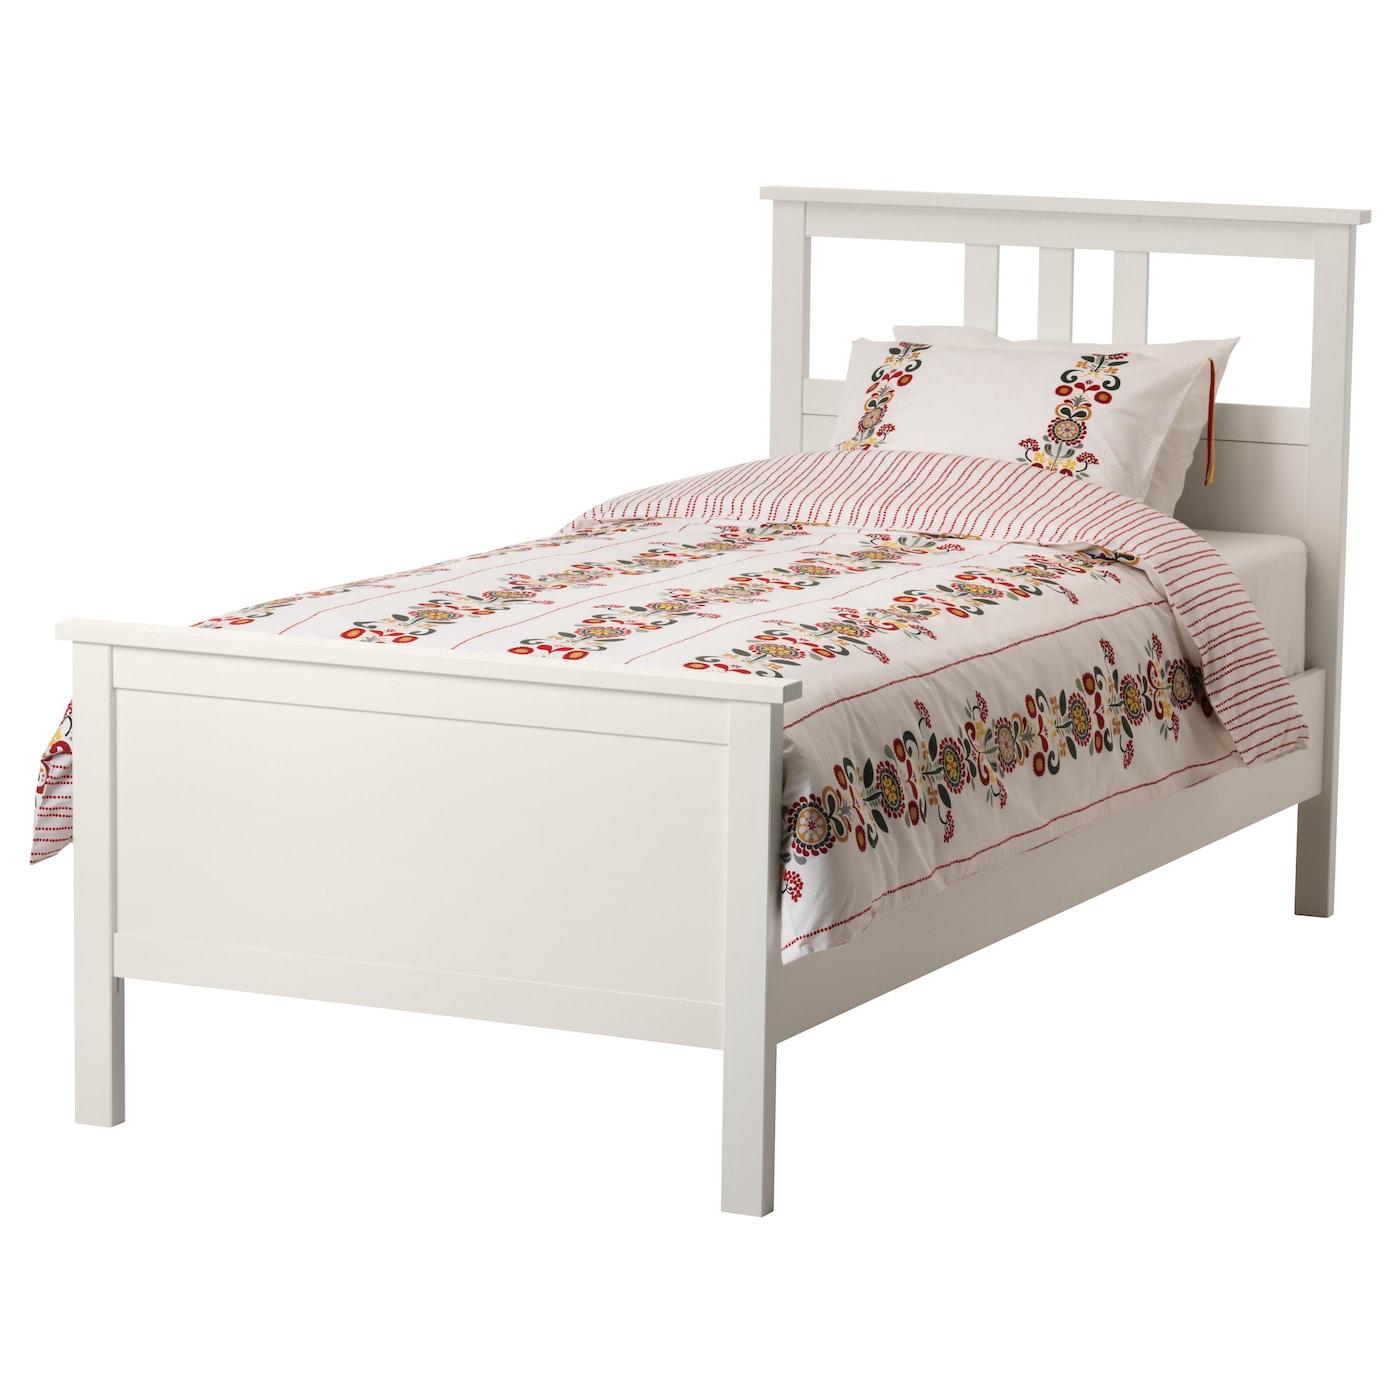 HEMNES Bed frame White stainlury Standard Single IKEA